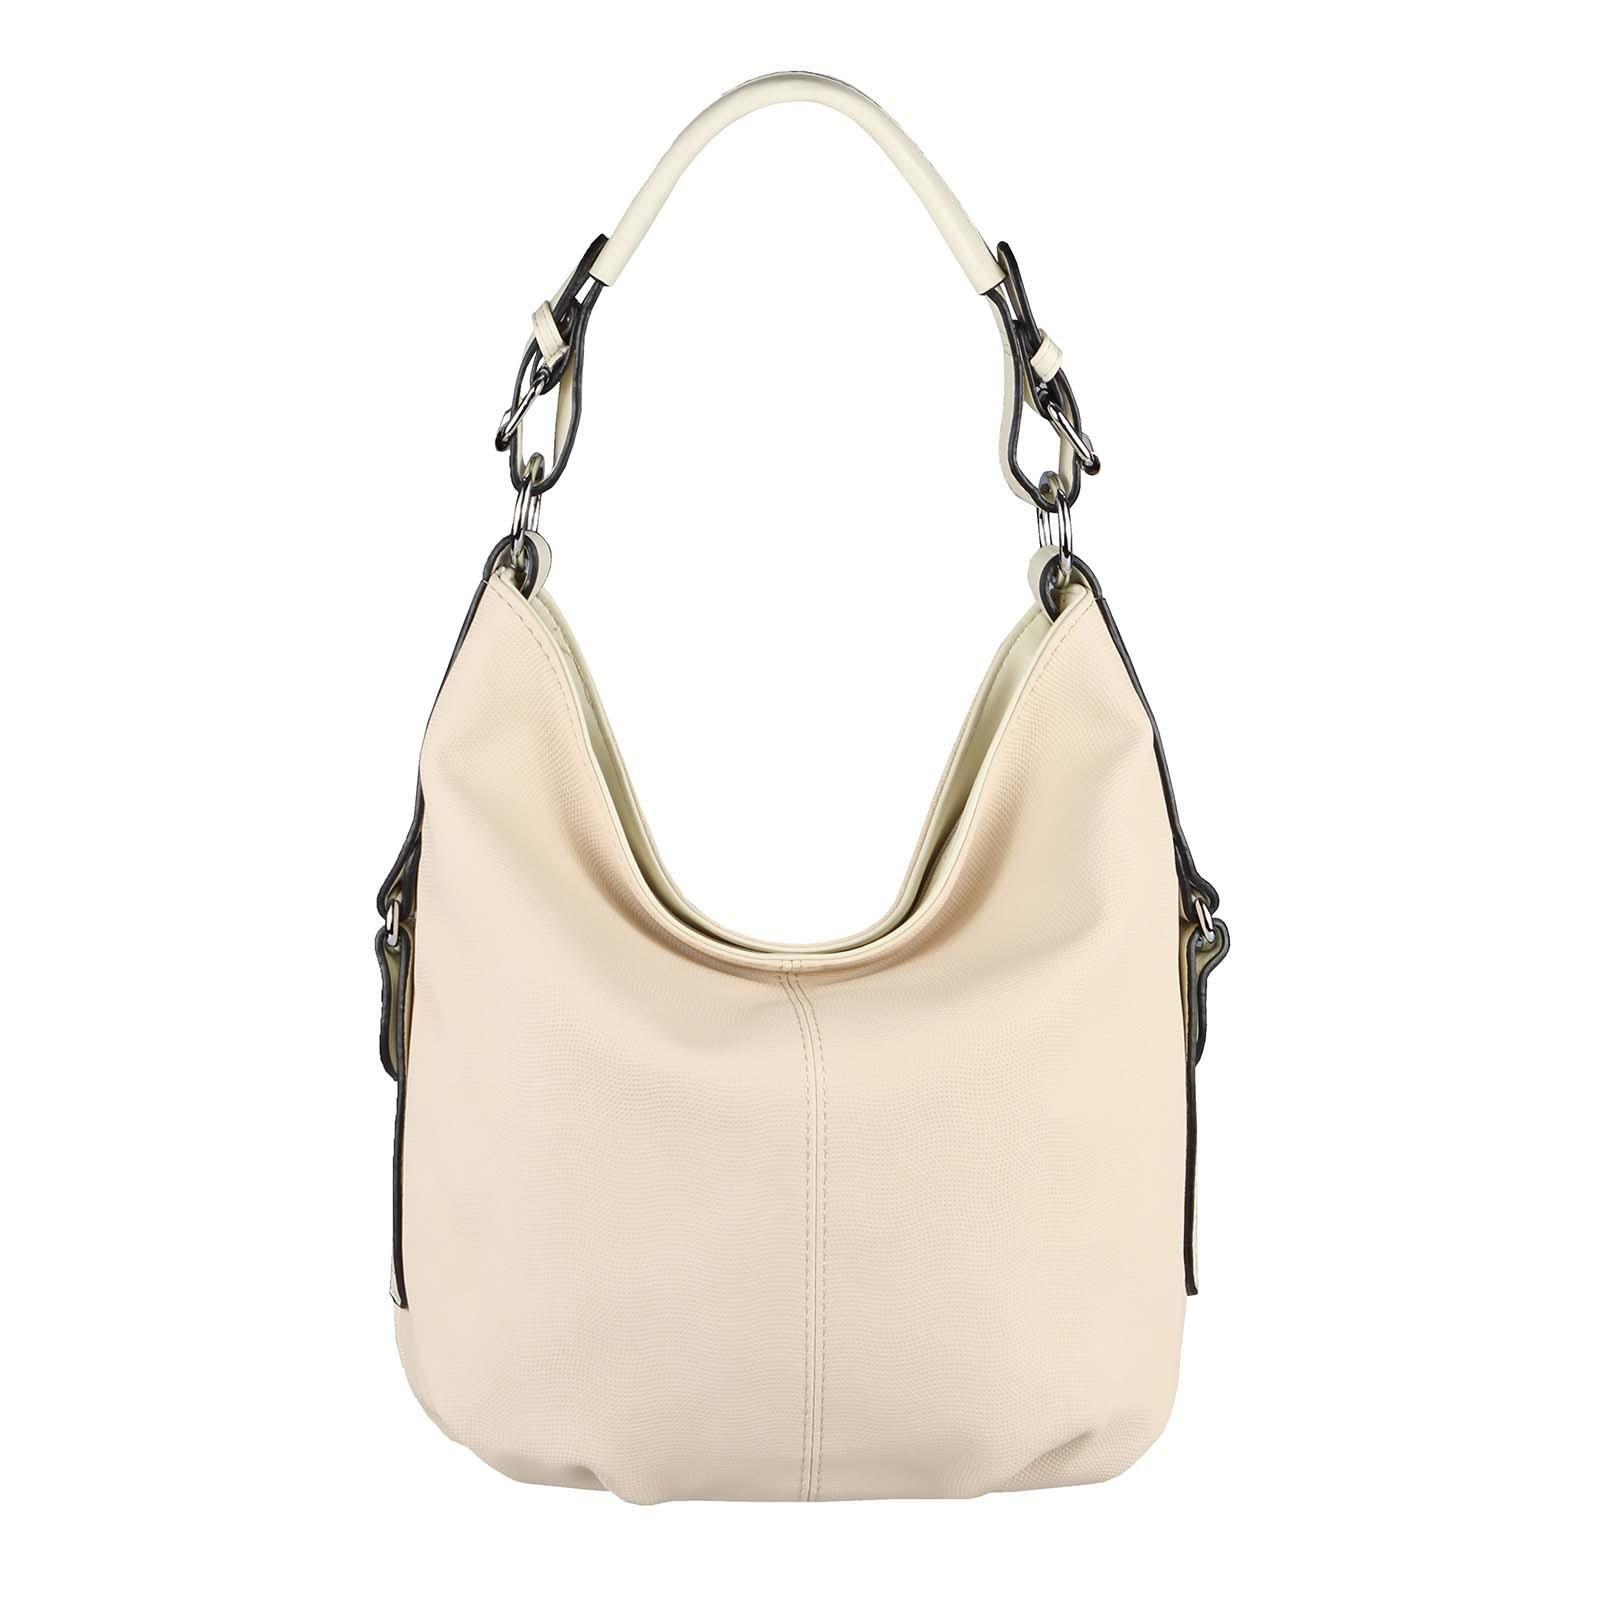 OBC WOMEN'S BAG SHOPPER Bolso Hobo Bolso de mano Bolso de hombro Bolso de hombro Bolso CrossOver CrossBag Bolso de mujer Bolso de viaje Bolso Hobo beige